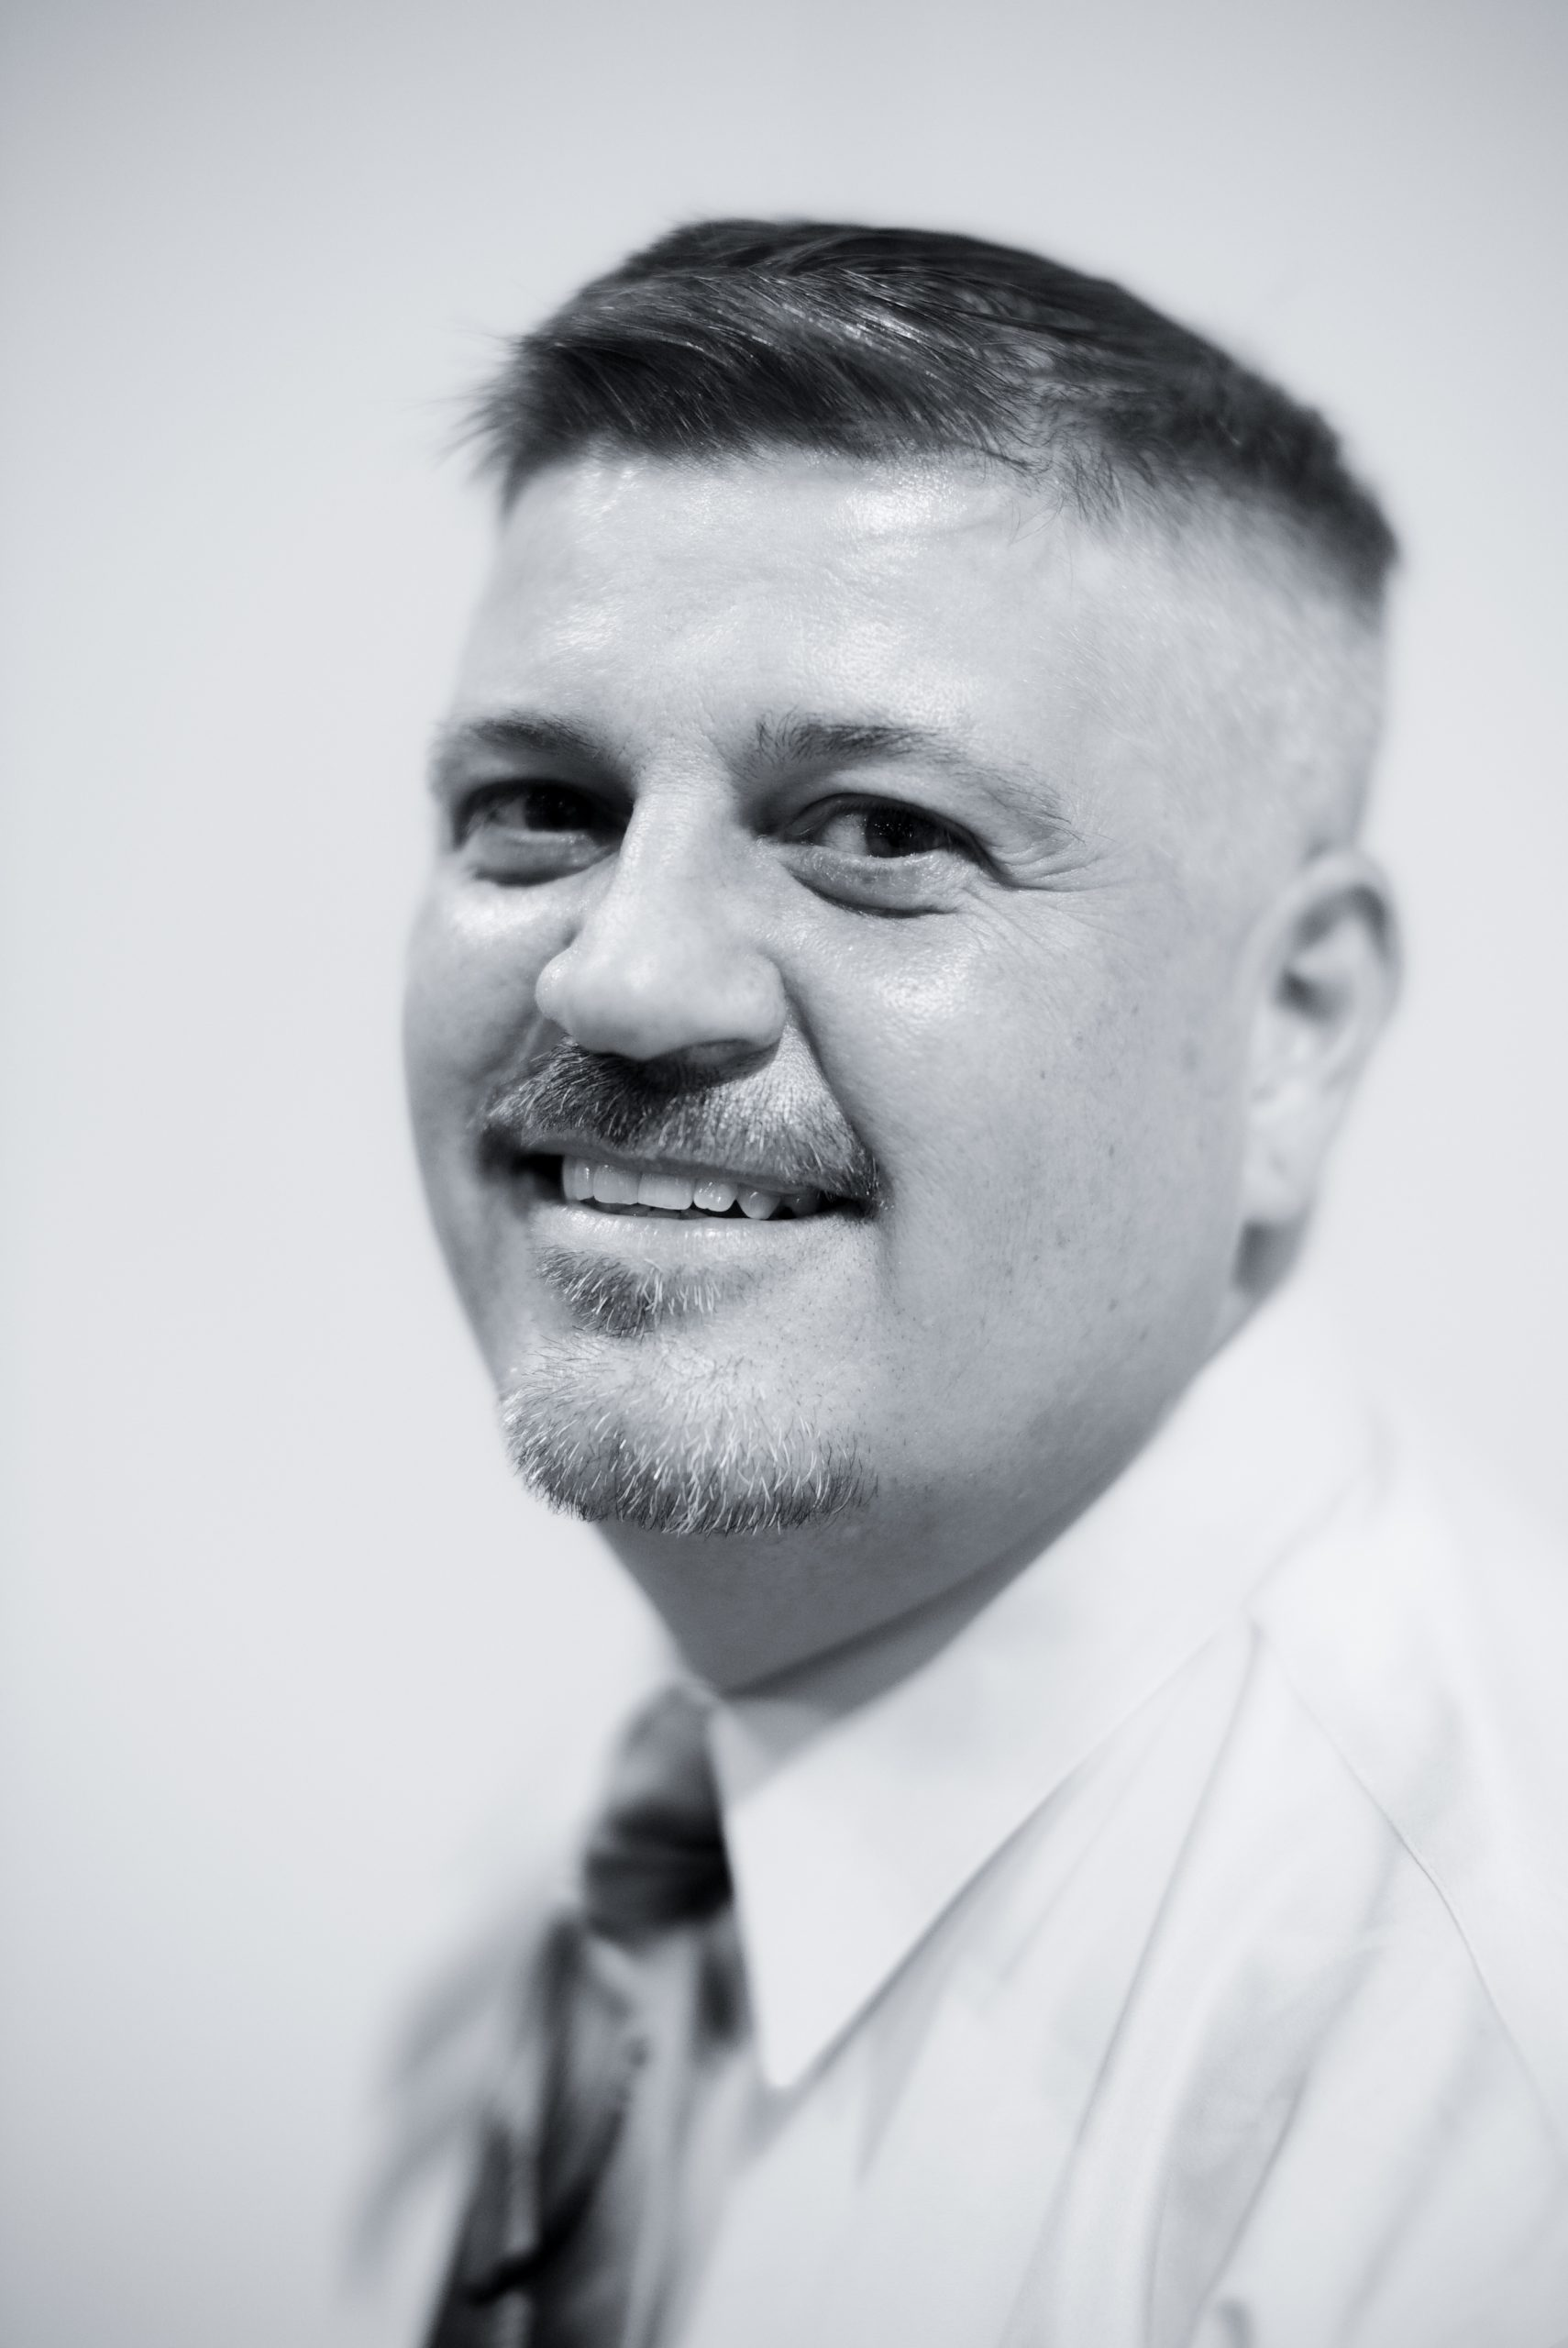 TX-05 - Kevin A. Hale